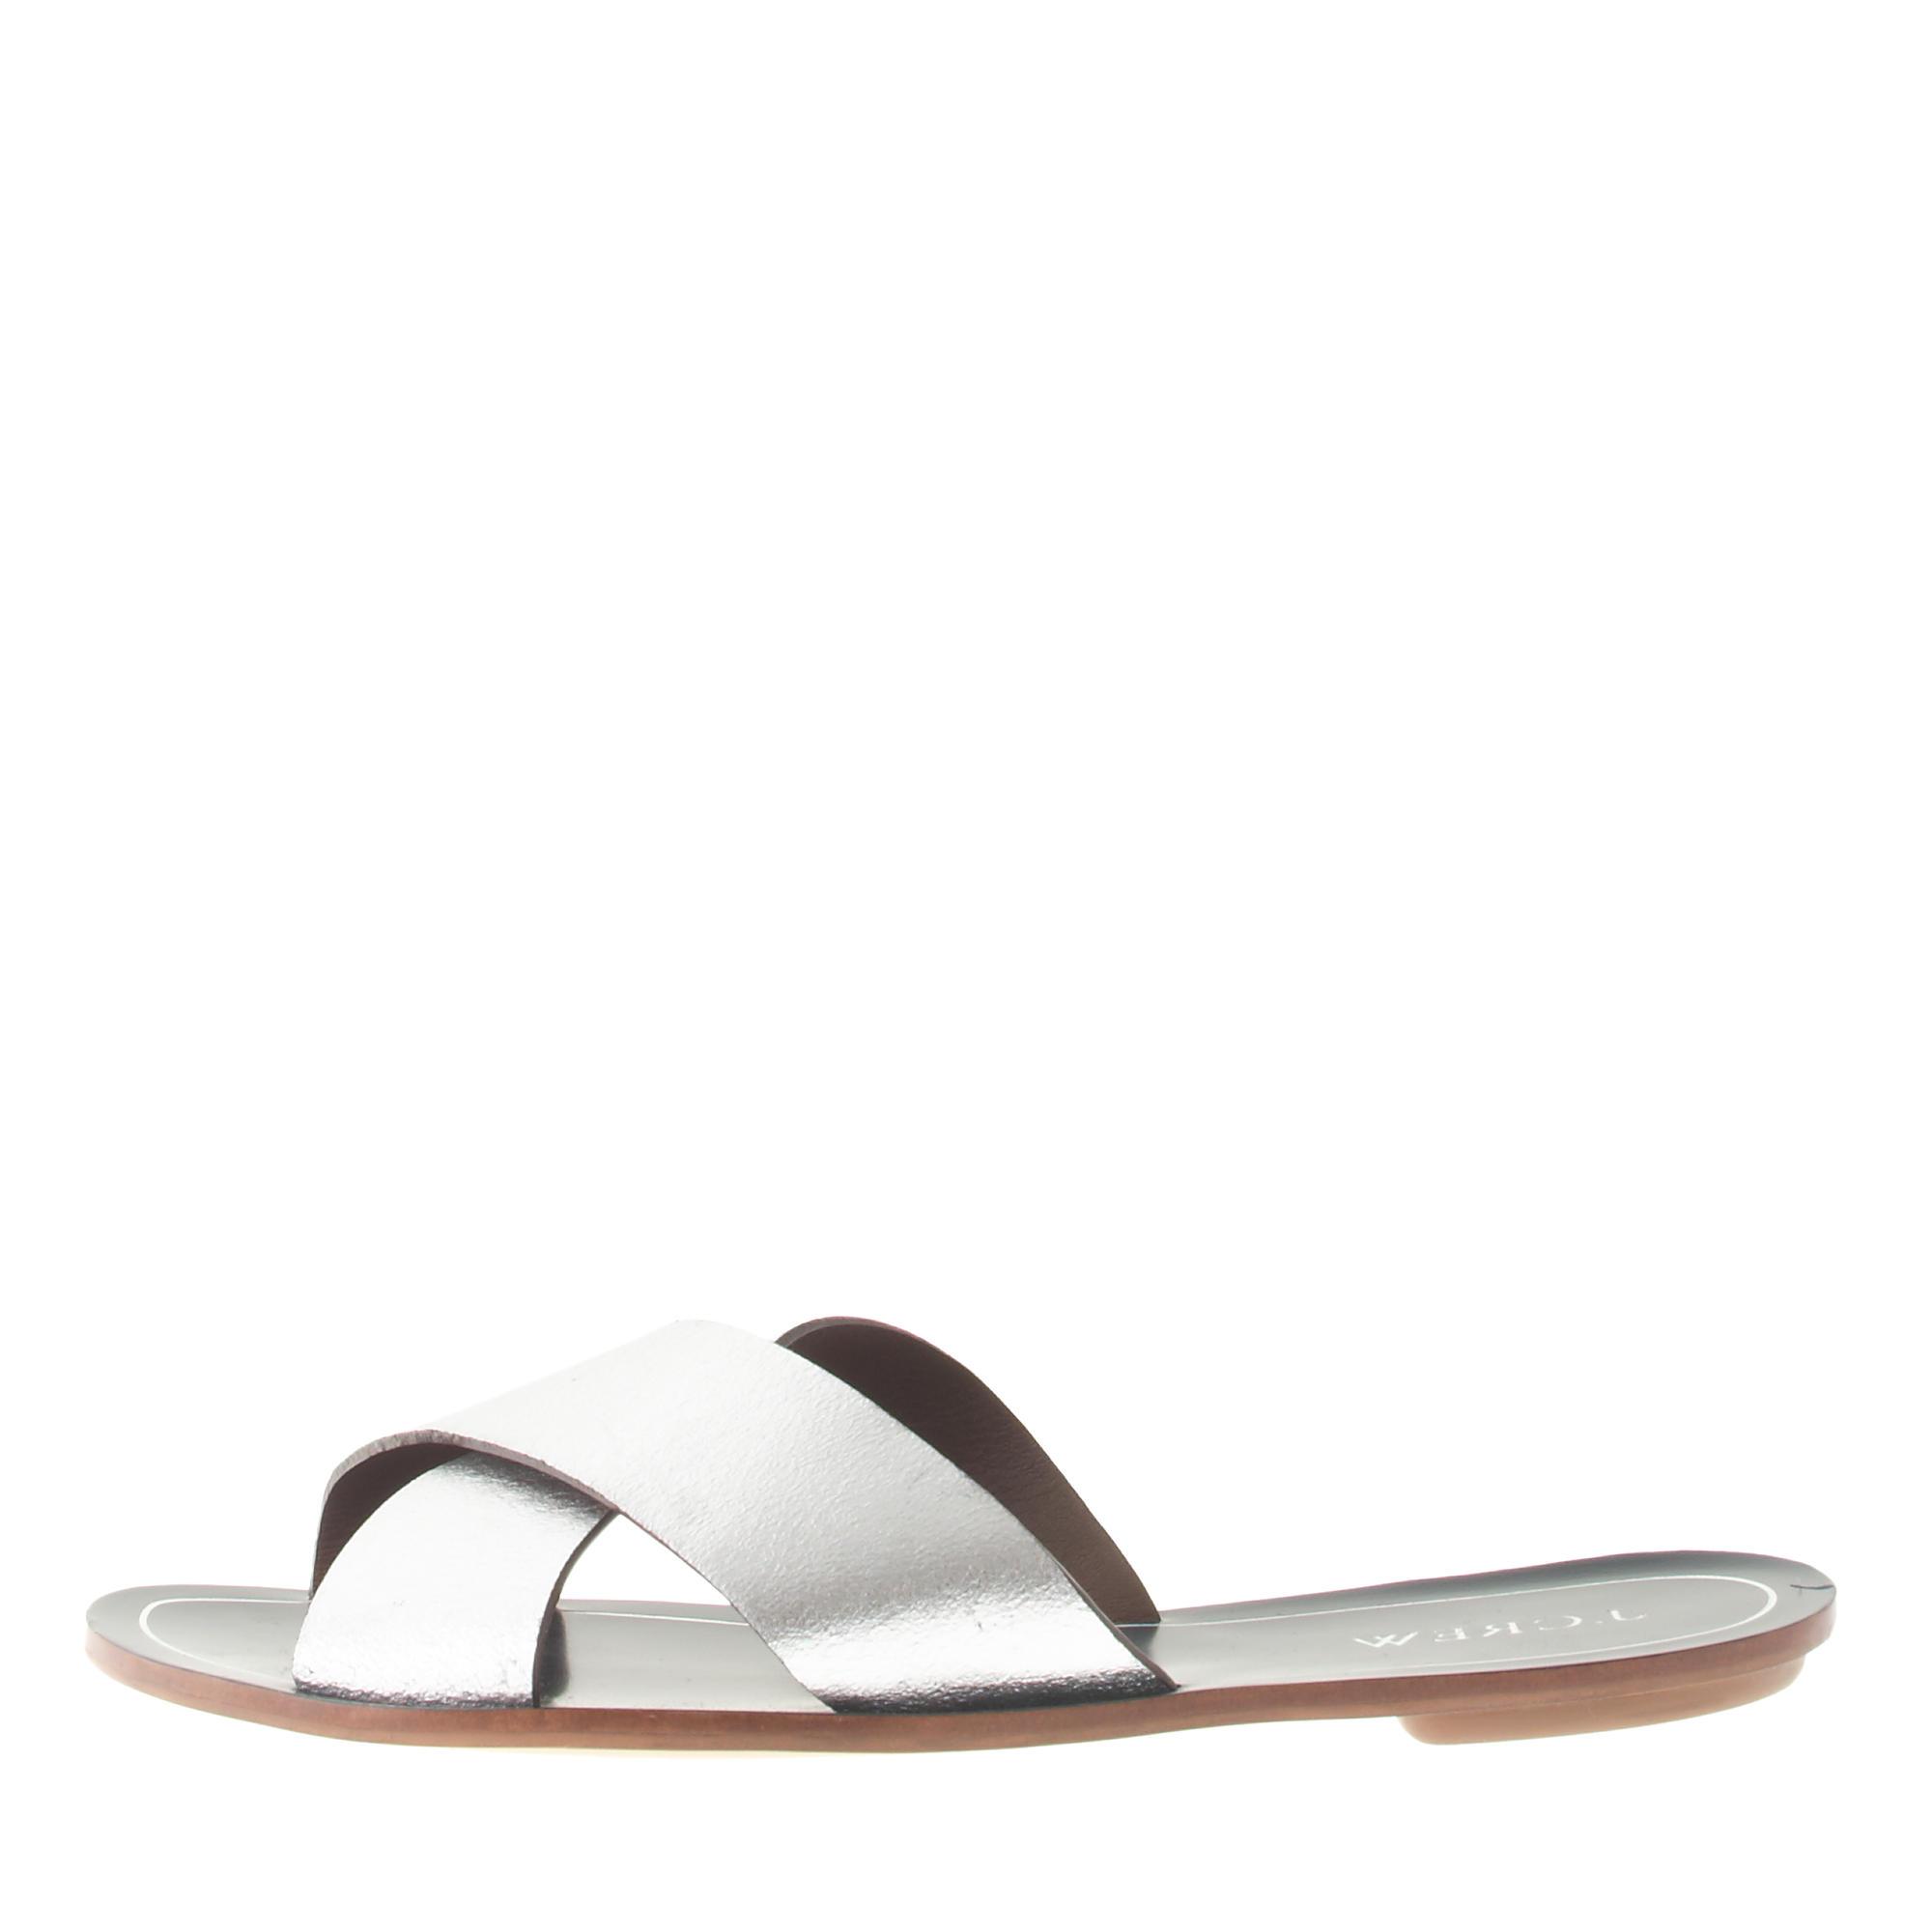 Metallic cyprus sandals